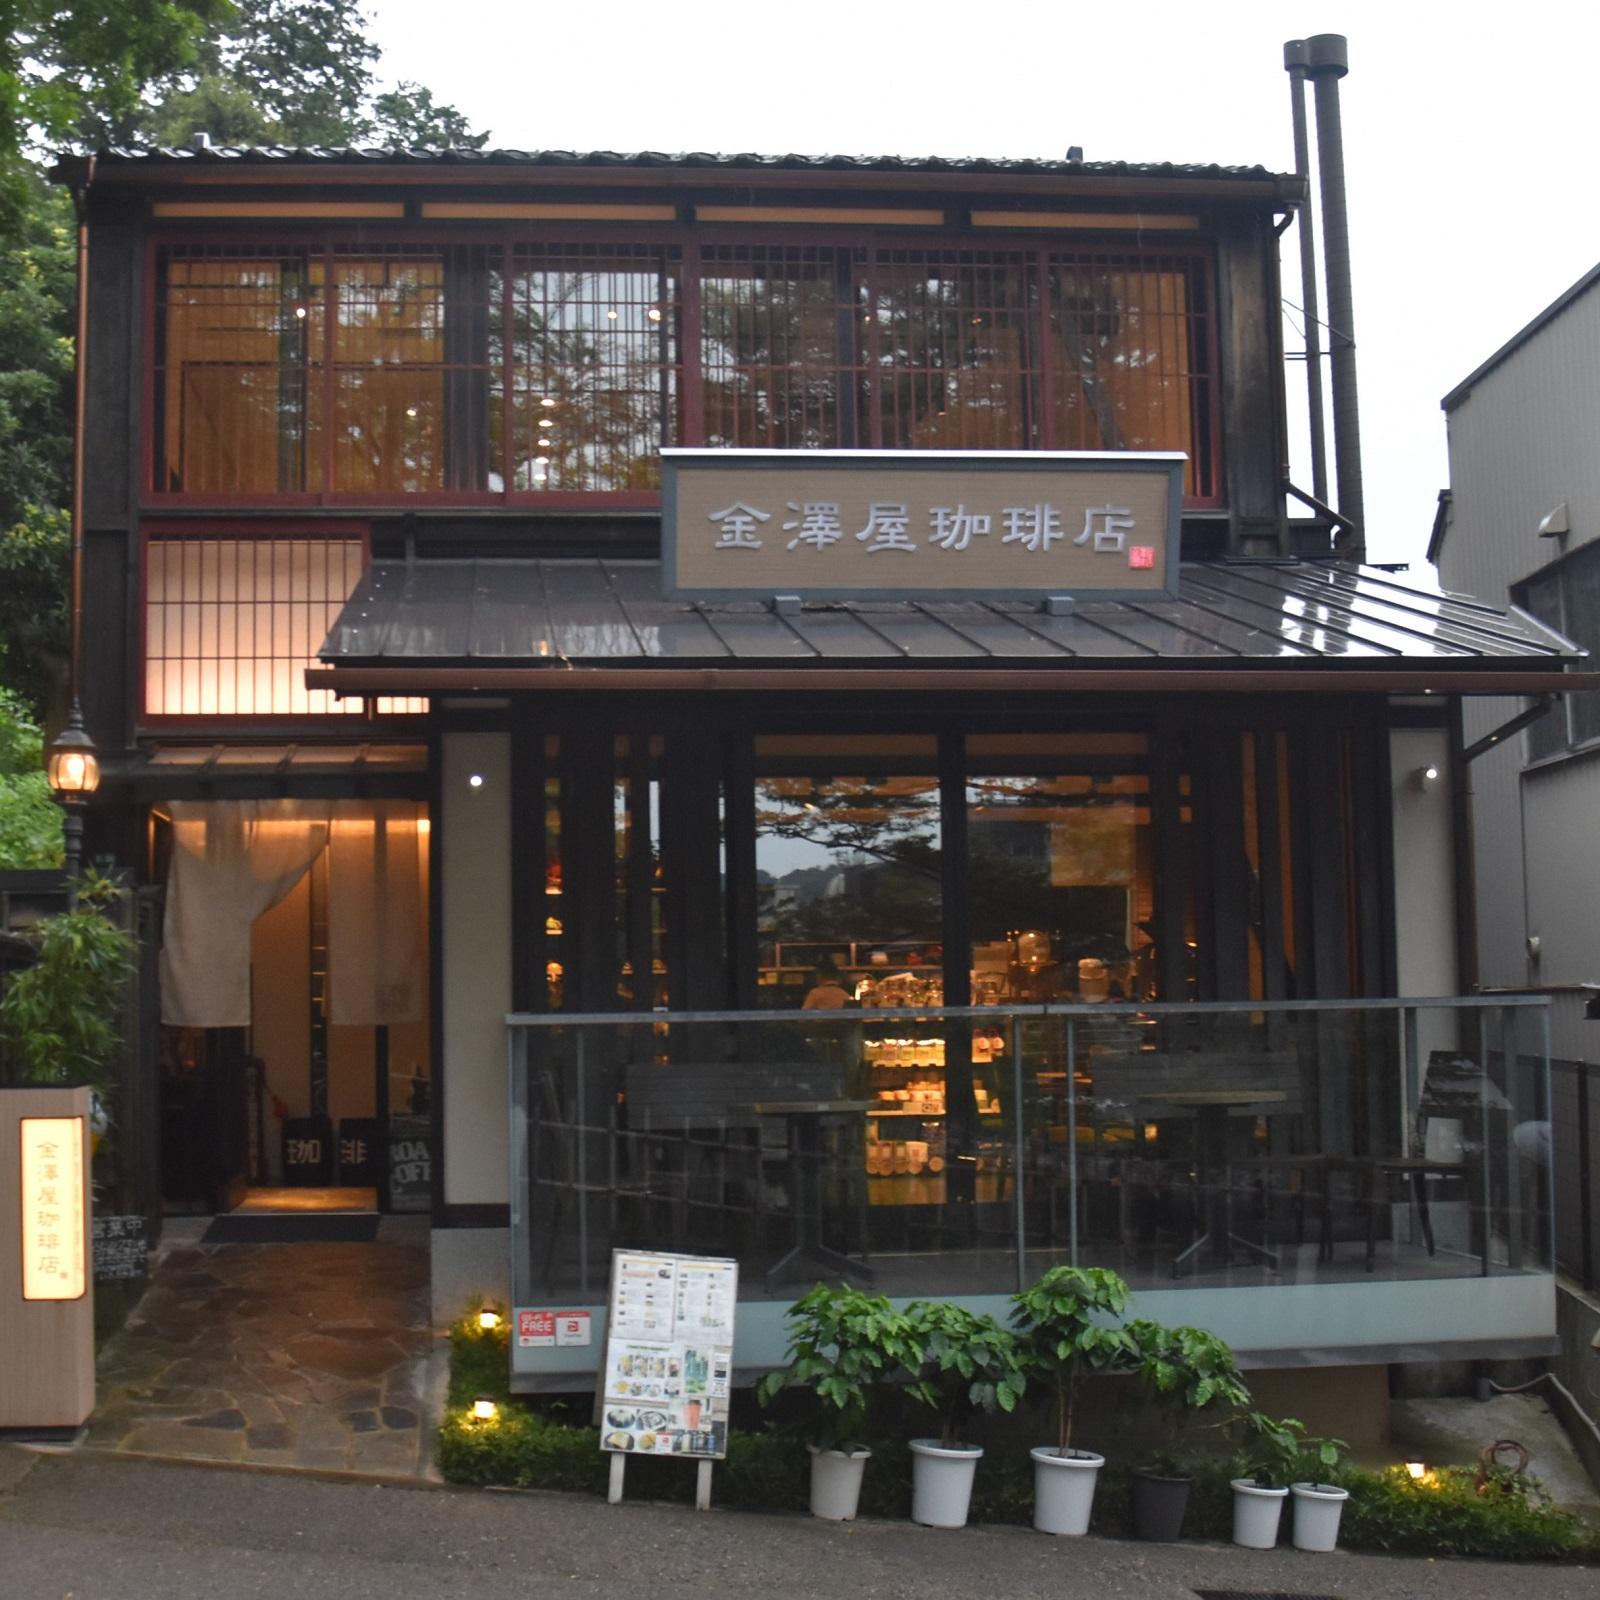 Kanazawaya Coffee Shop Head Office, a welcome sight on a rainy day, just outside the northern entrance to Kanazawa Castle.